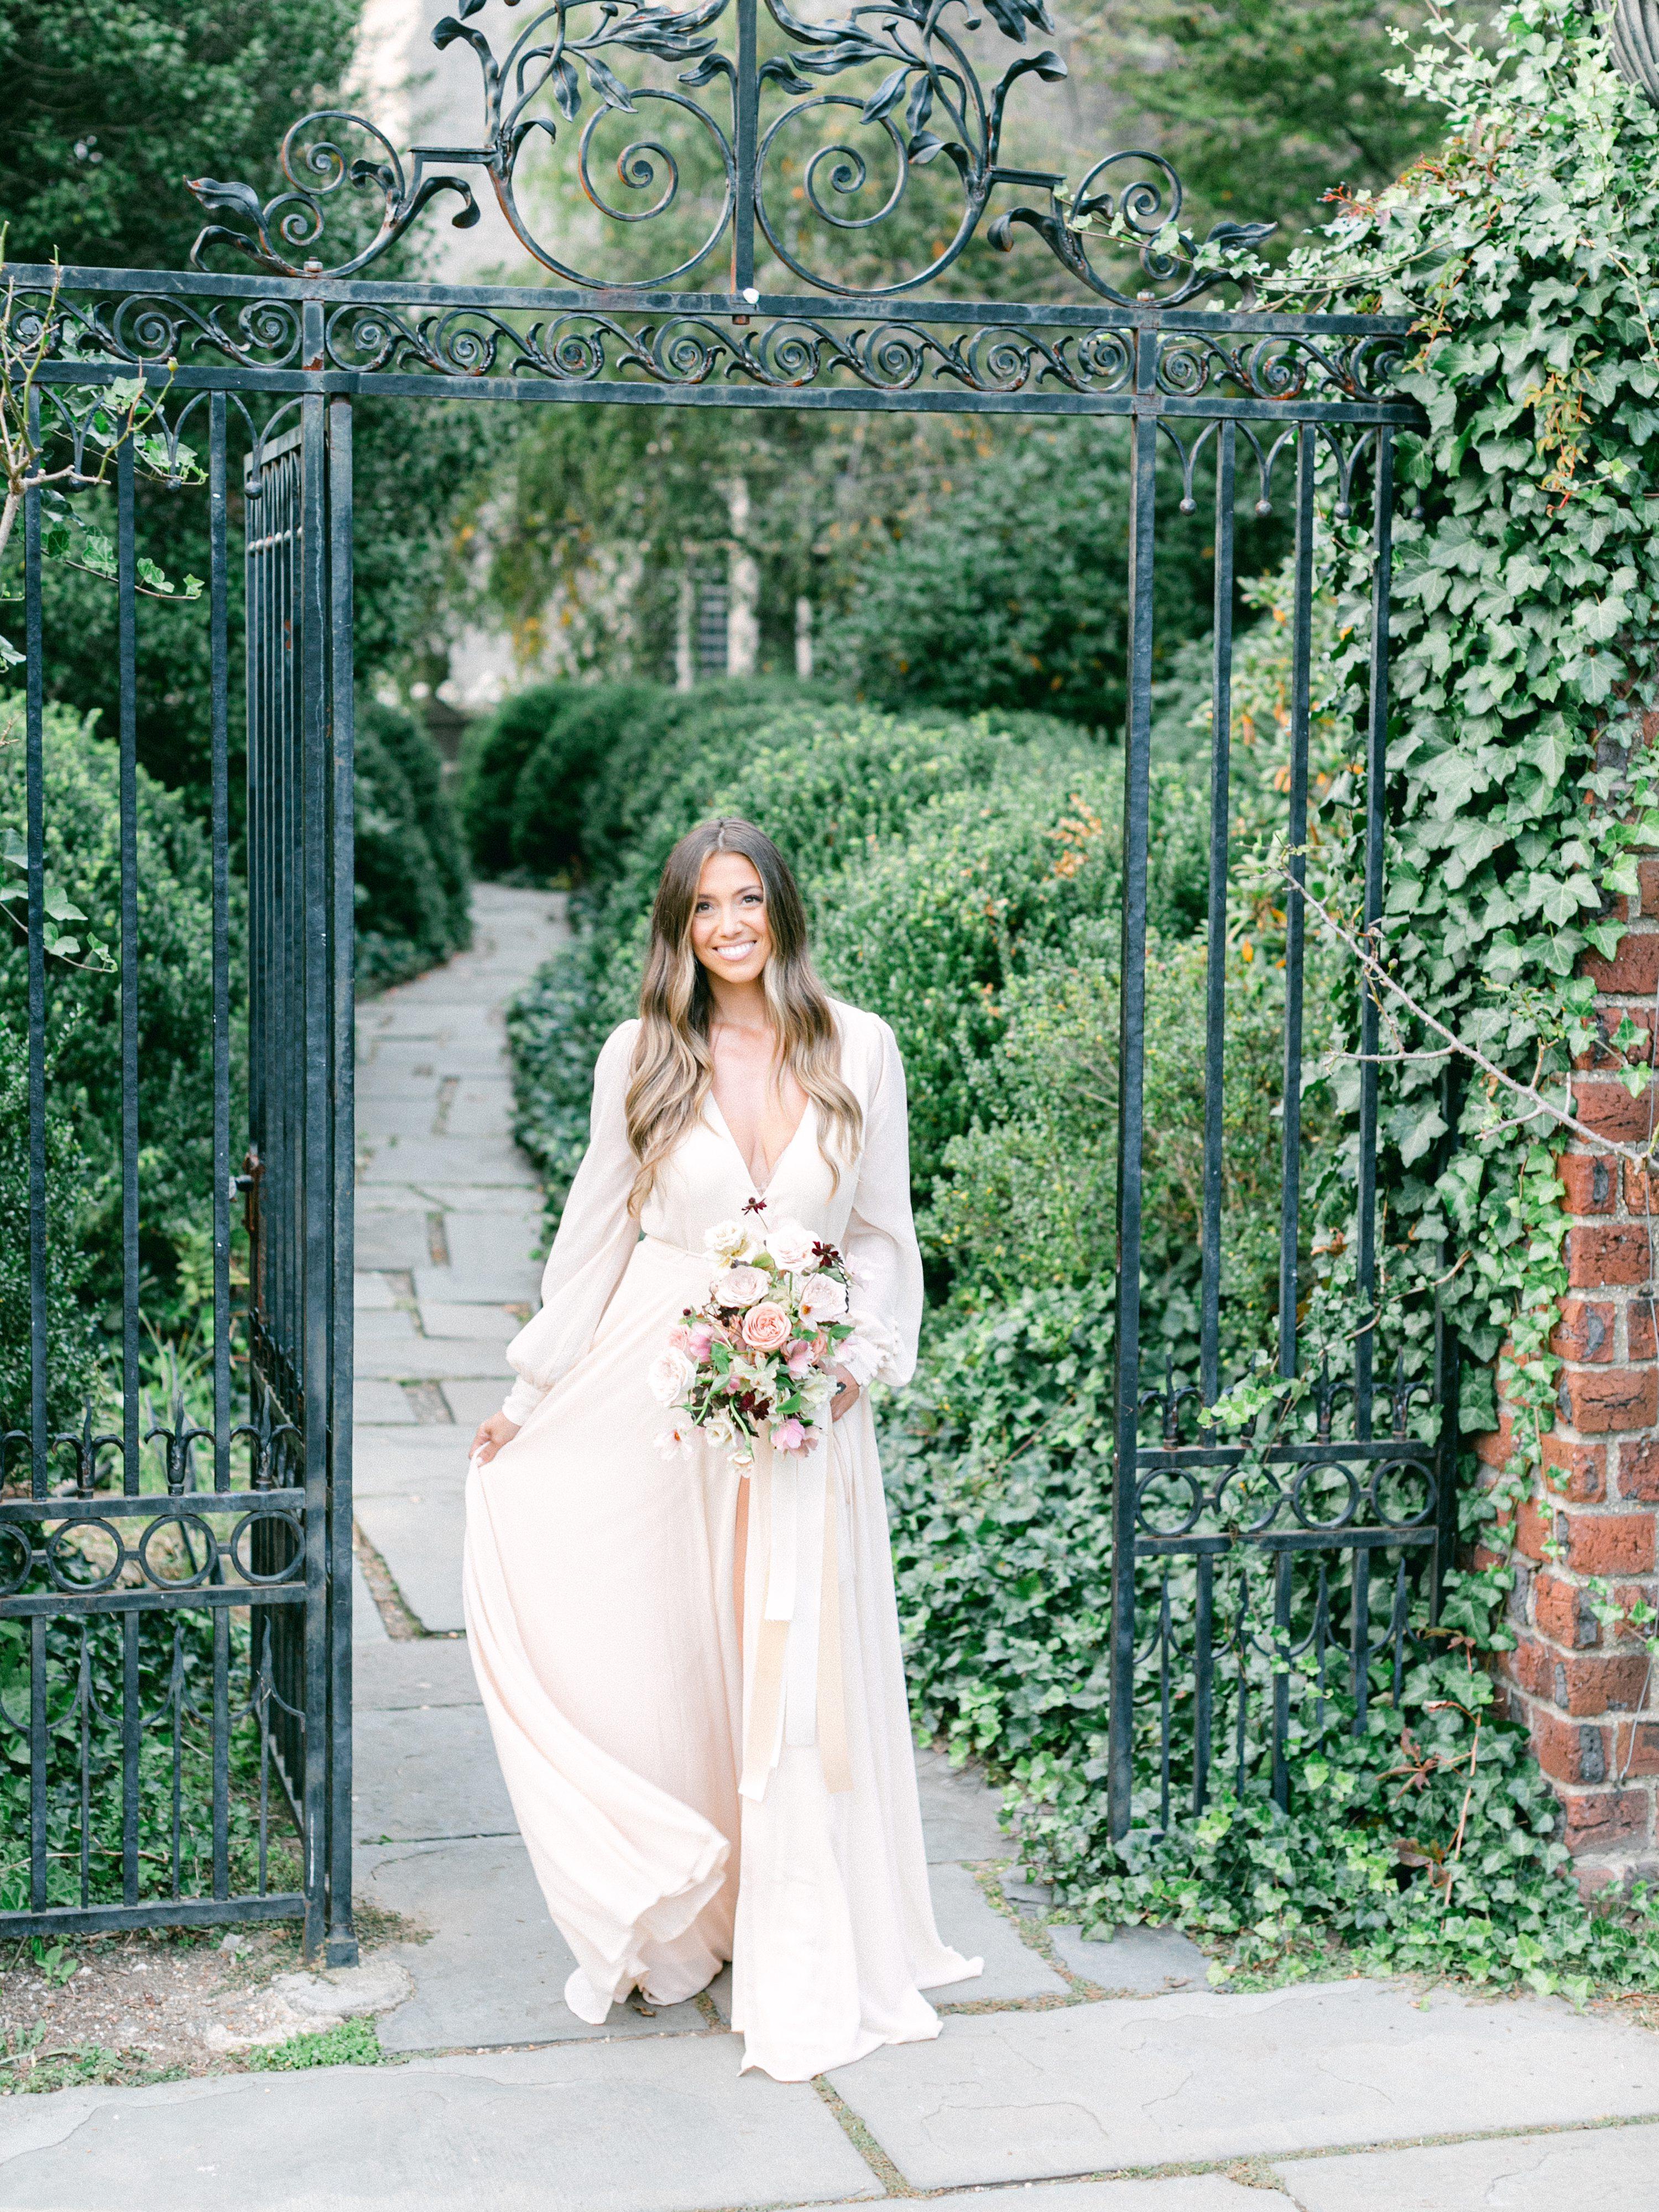 New York Wedding Photographer,Film Photographer